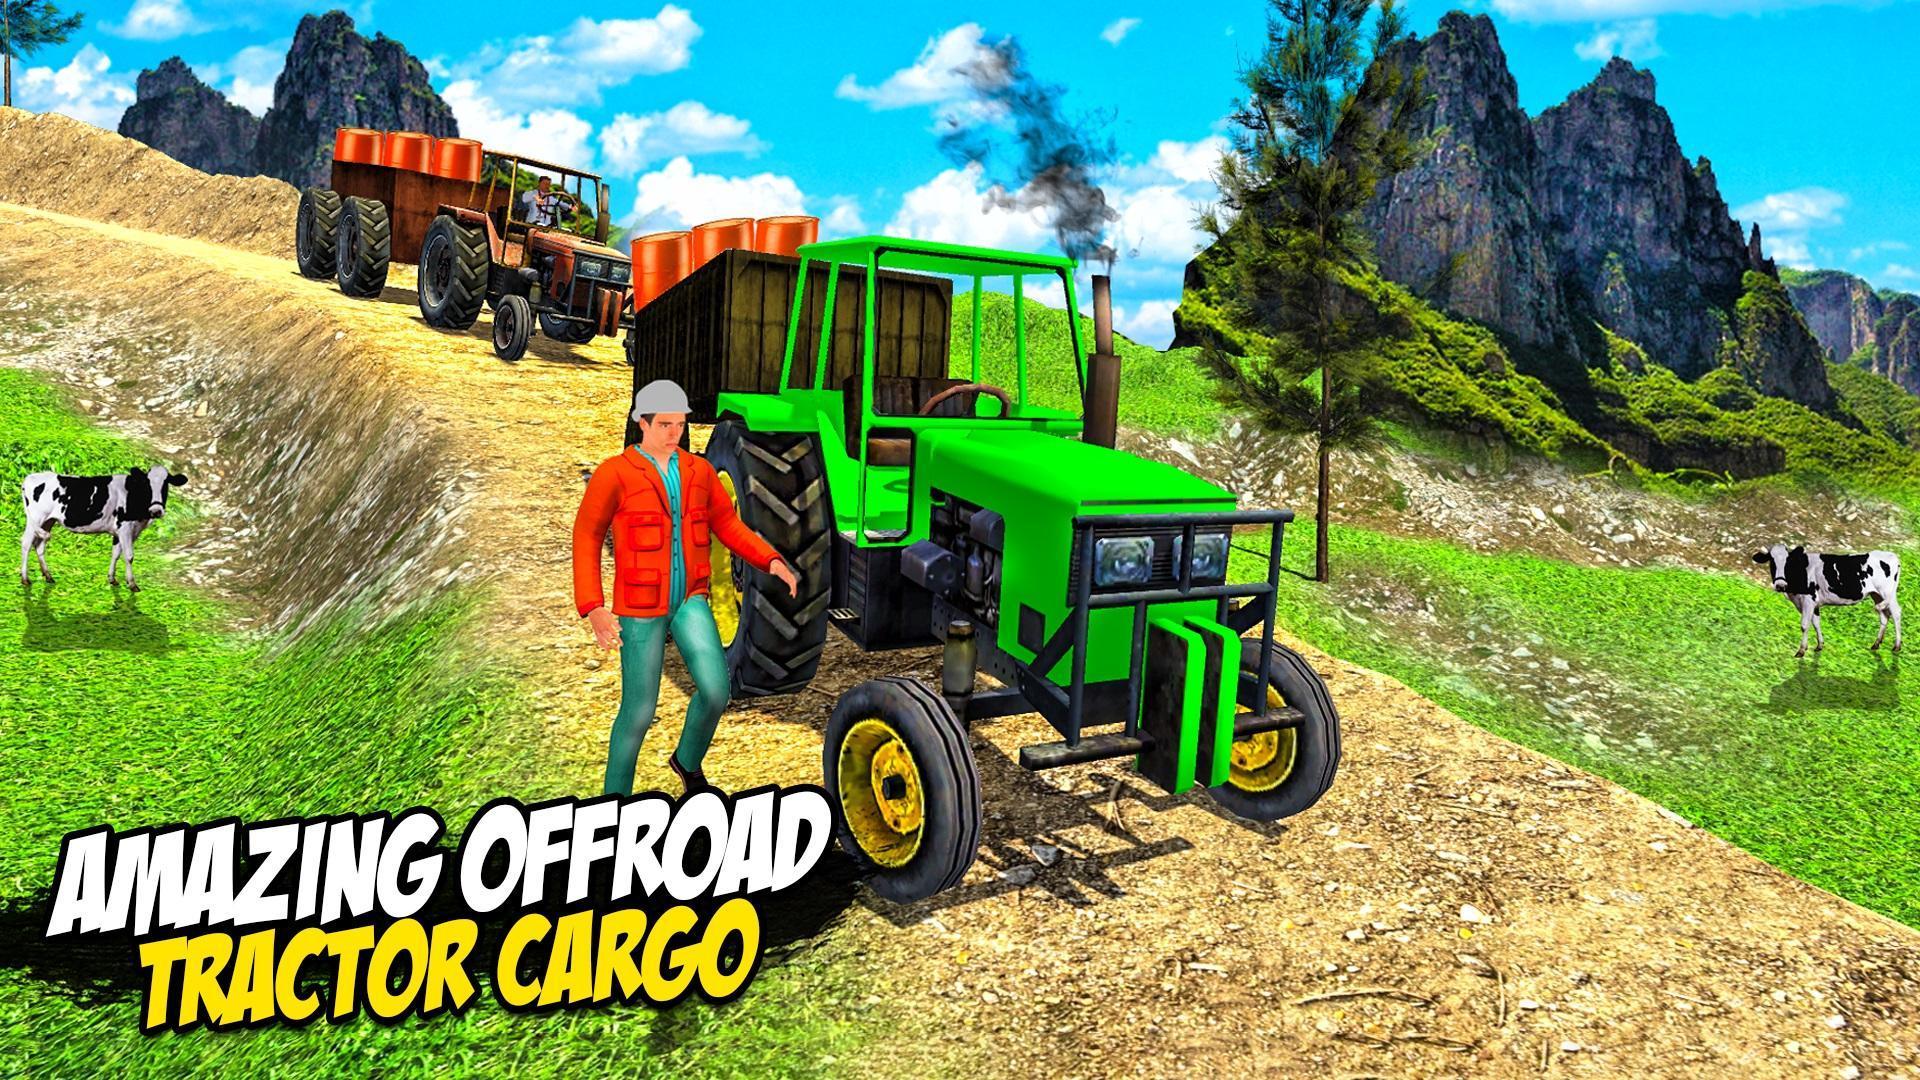 Heavy Tractor Trolley: Tractor Cargo Simulator🚜🚜 3.1 Screenshot 23